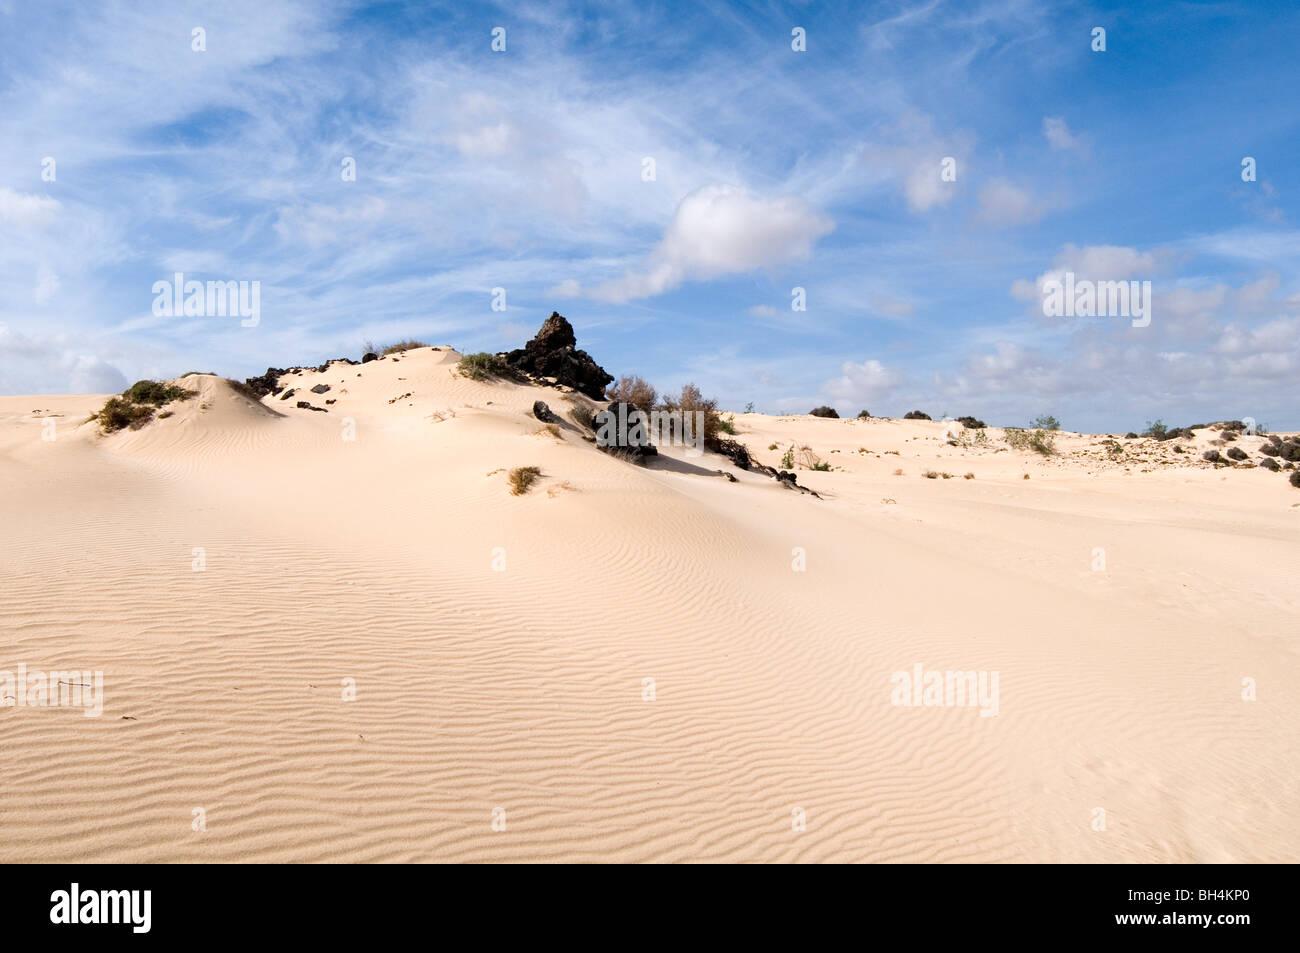 sand dune dunes desert wind blown deserts sandy blue sky skies - Stock Image